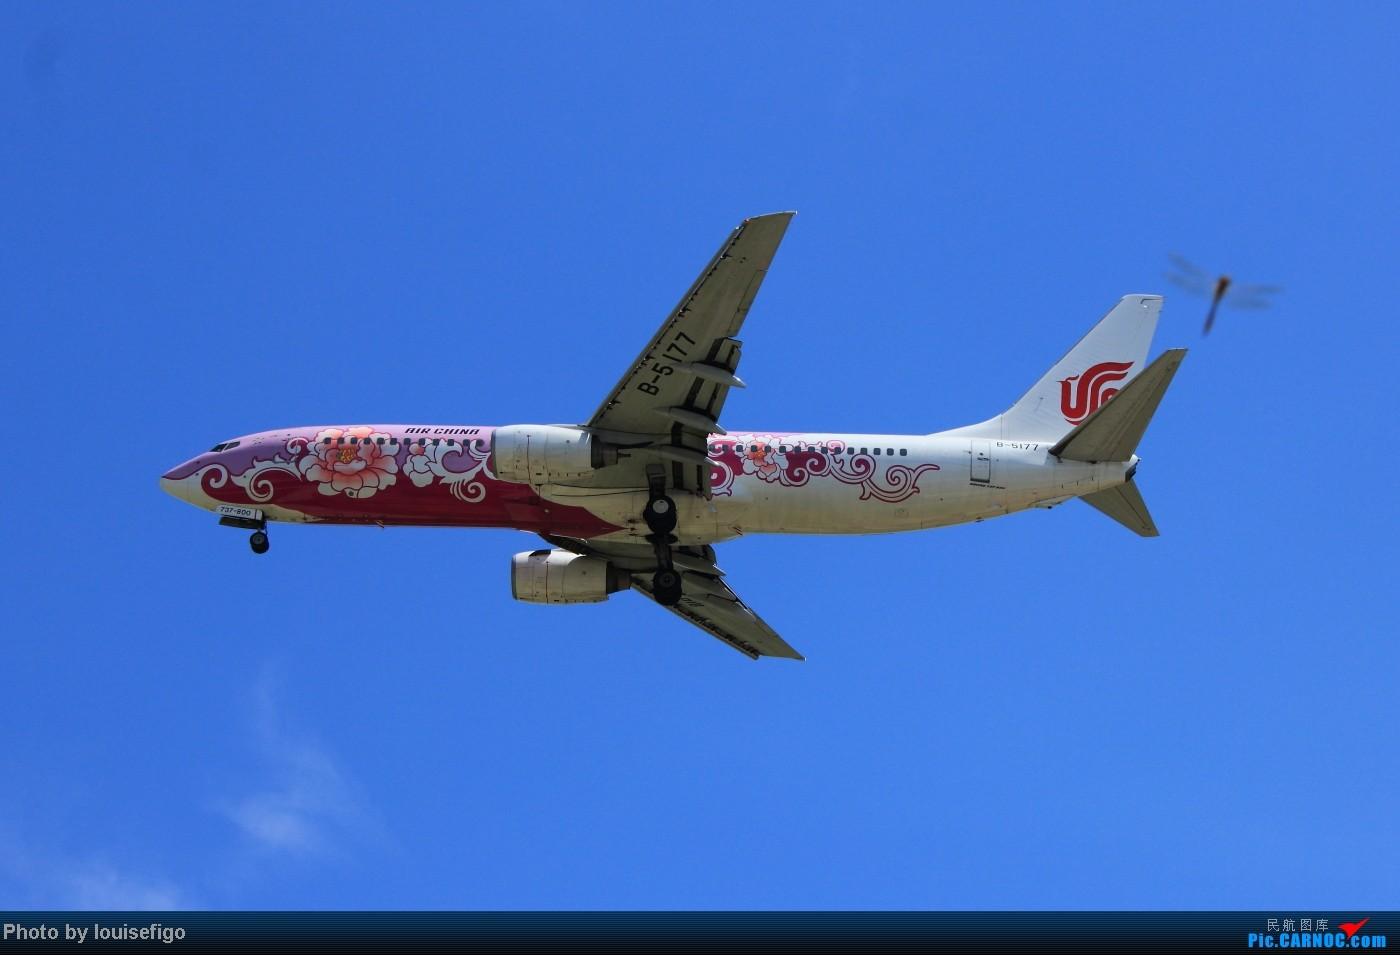 Re:[原创]两张难得一见  绝对不一样的牡丹双飞!粉牡丹与红牡丹!  :) BOEING 737-800 B-5177 北京首都国际机场